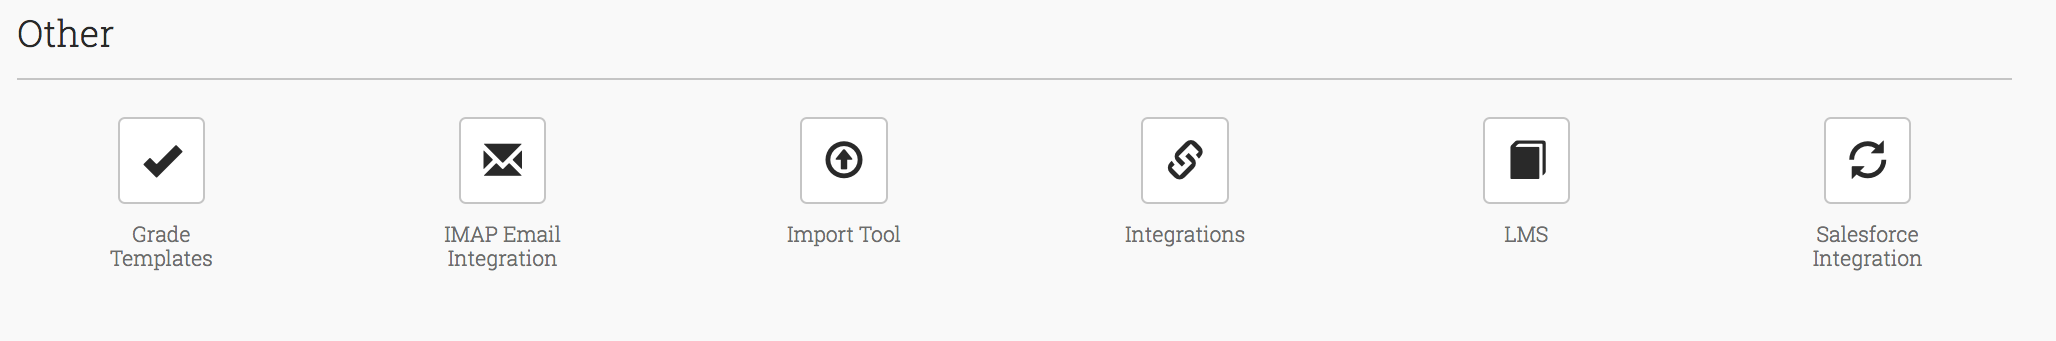 Control Panel Grade Templates